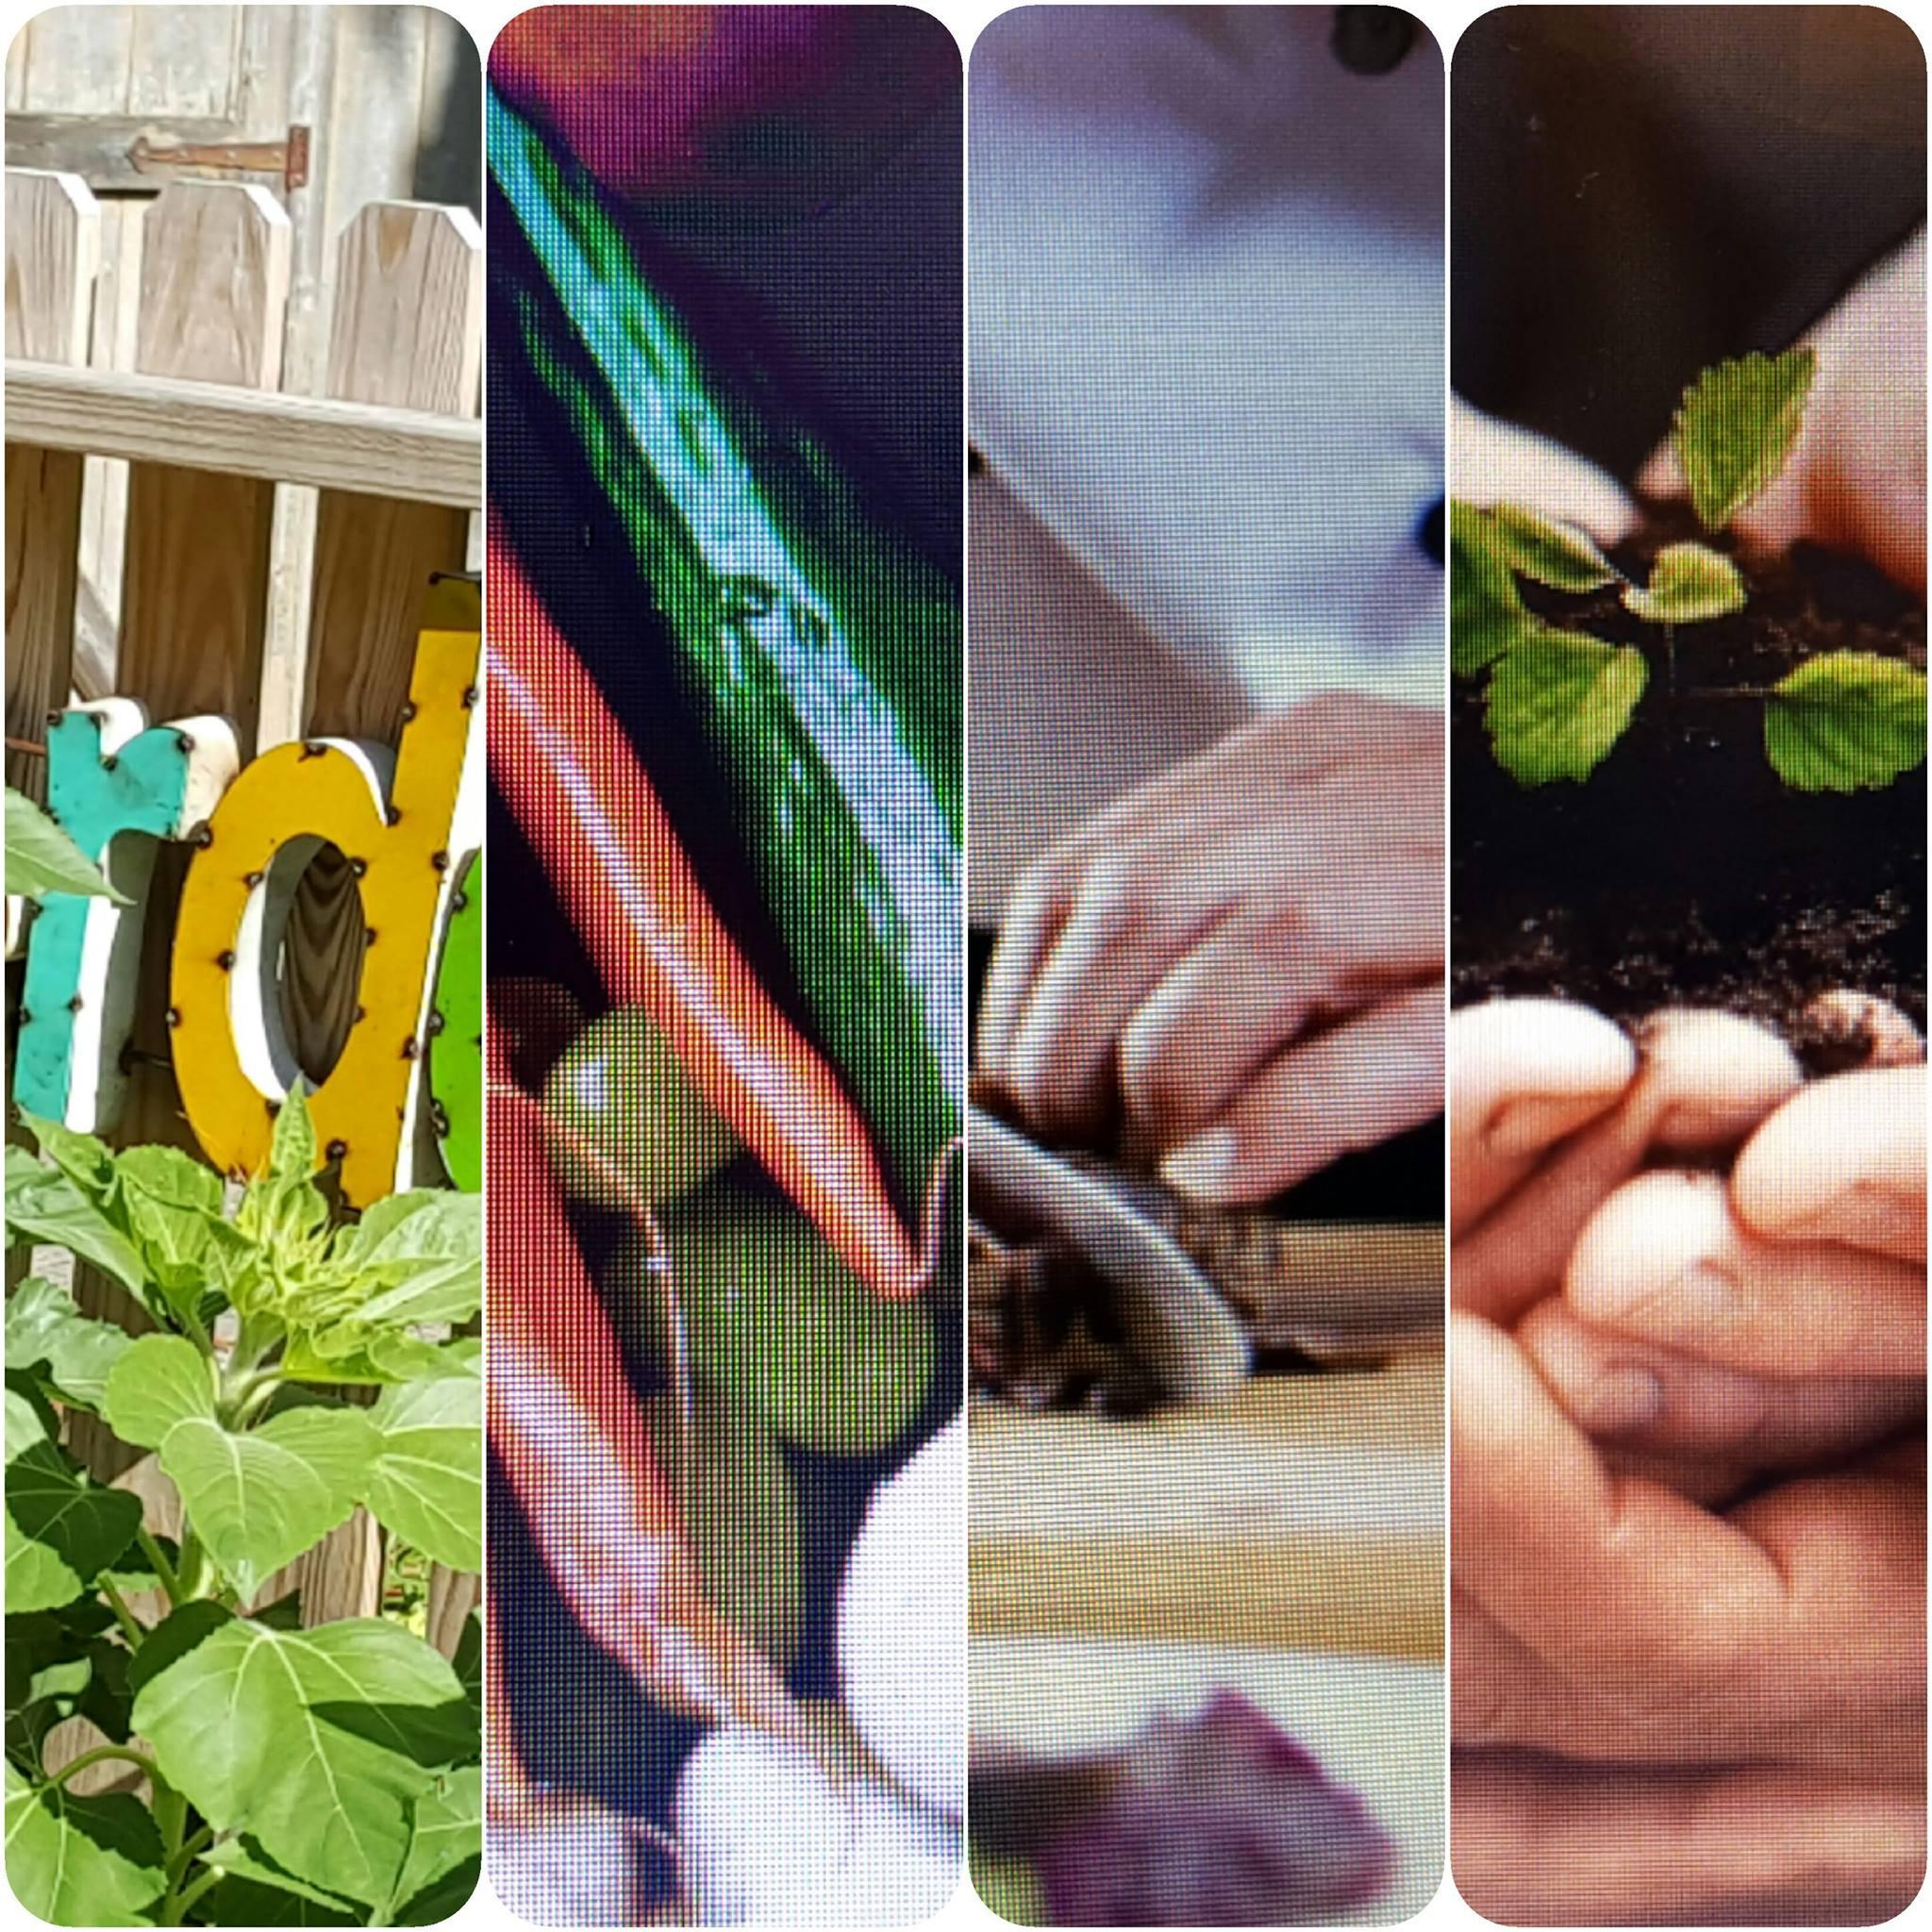 Creating Edible Environments